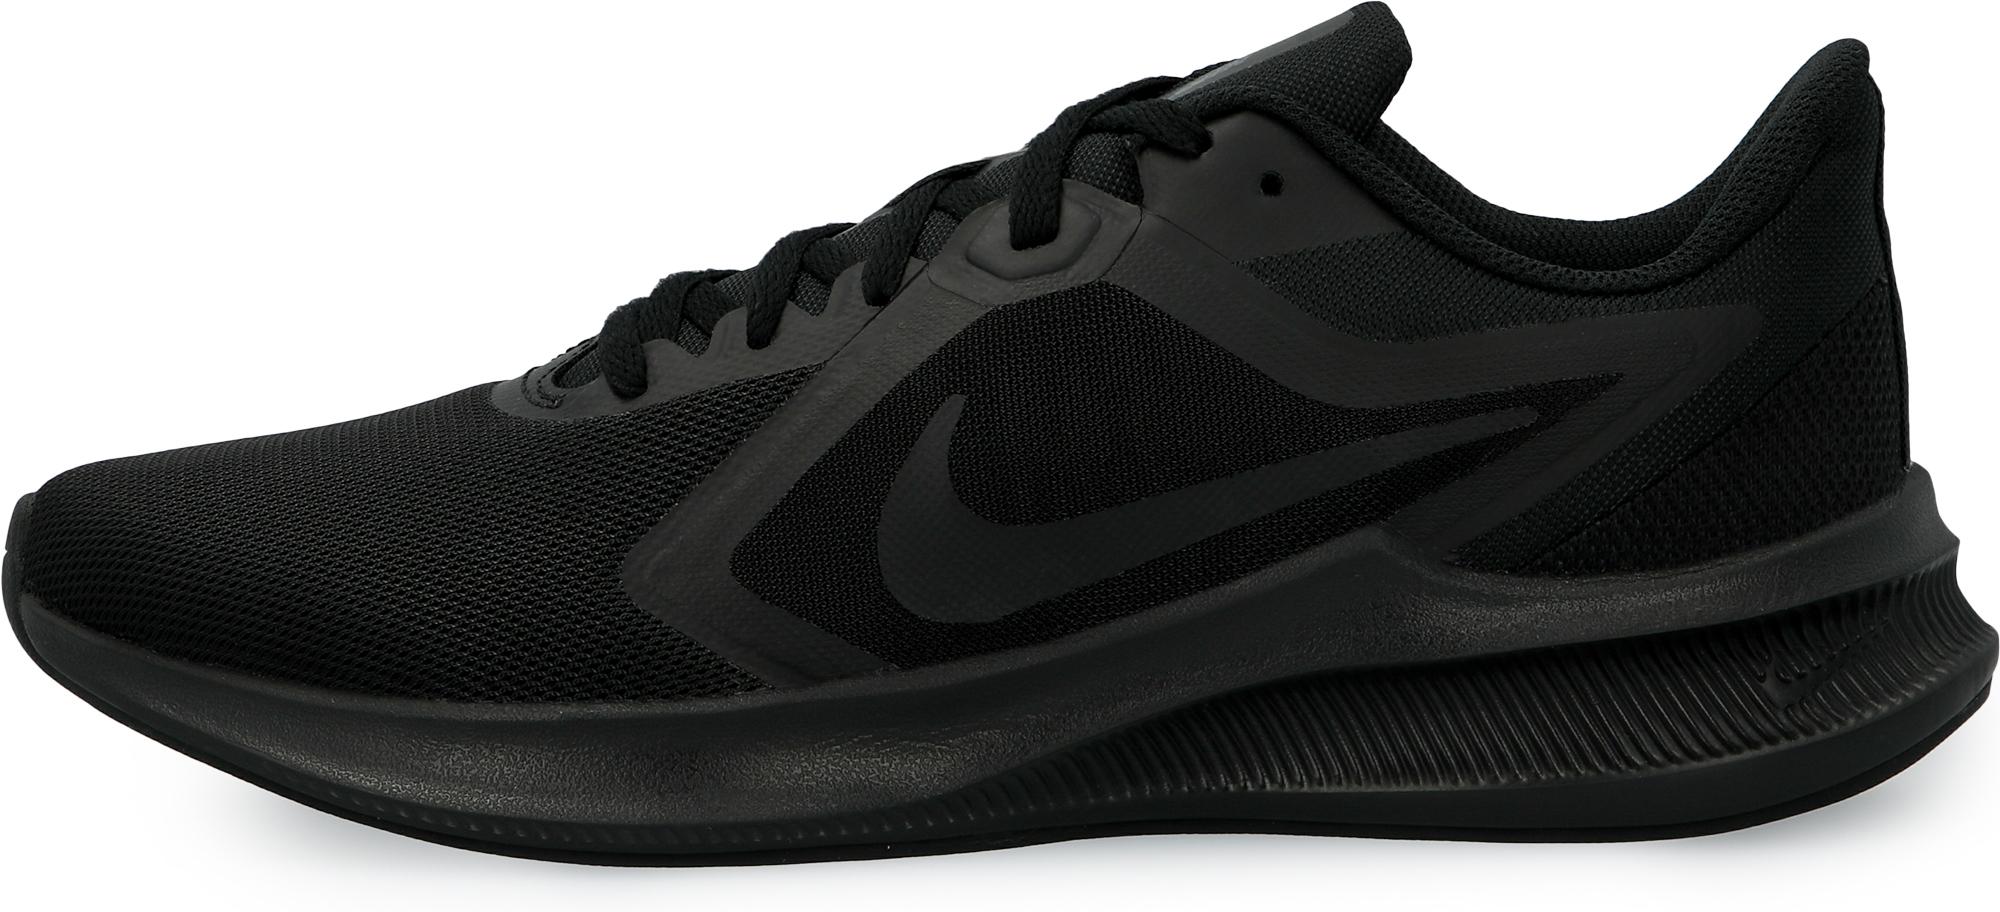 Nike Кроссовки женские Nike Downshifter 10, размер 37.5